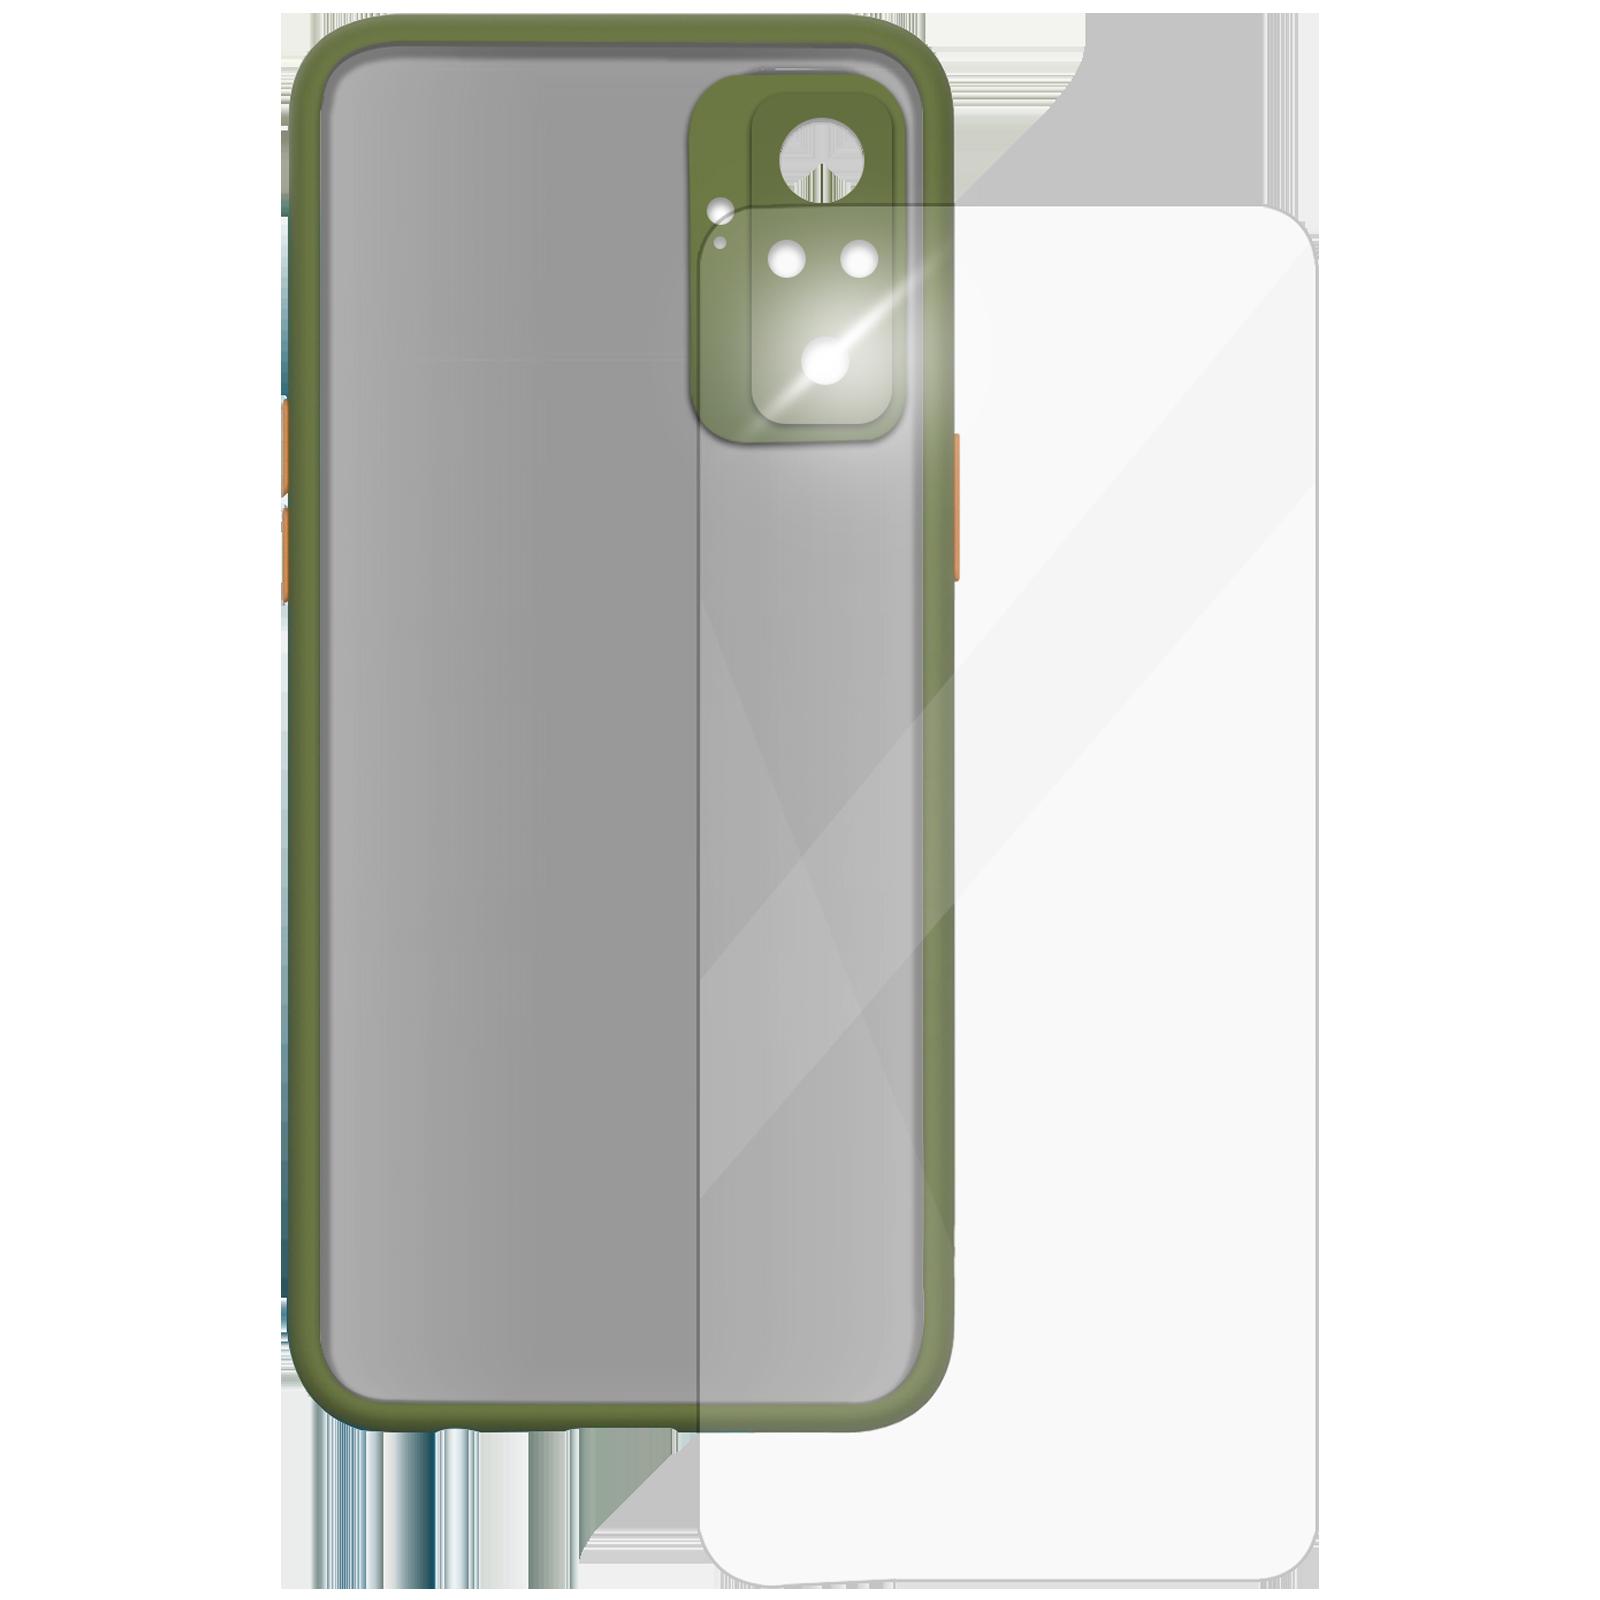 Arrow Camera Duplex Back Case and Screen Protector Bundle For Xiaomi Redmi Note 10 Pro (Ultra Transparent Visibility, AR-1012, Light Green)_1